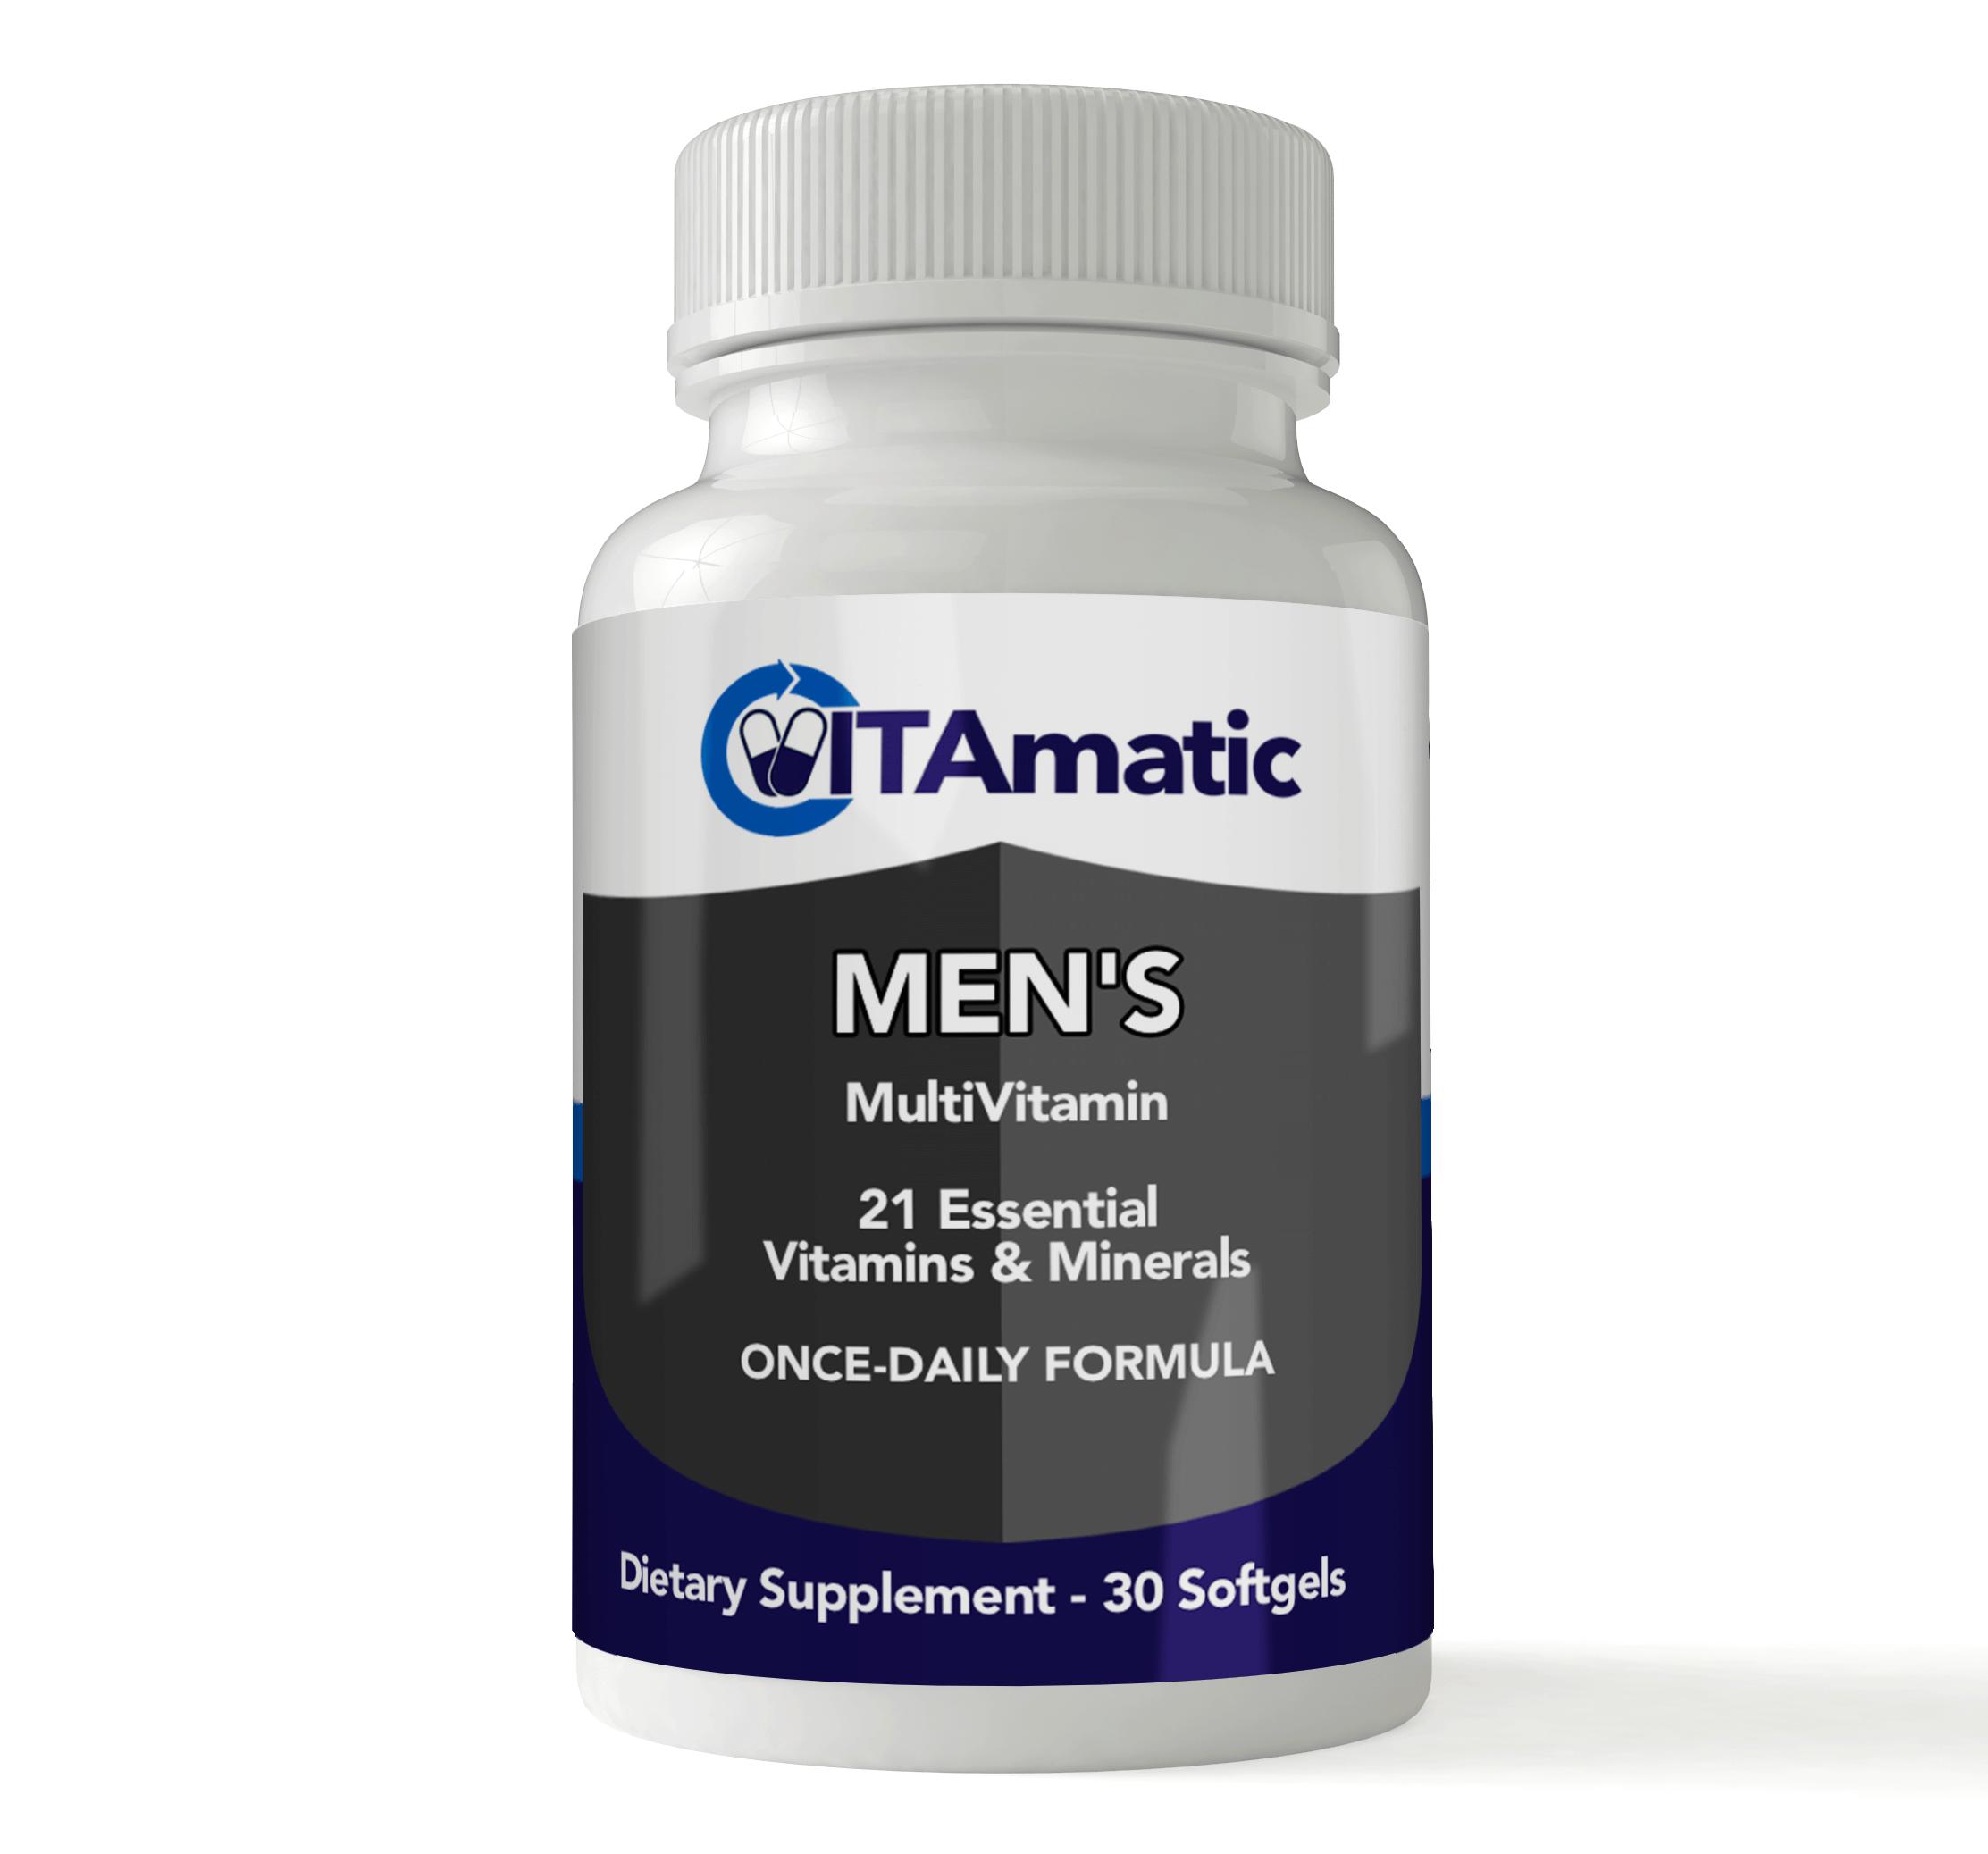 Editor's Choice: Vitamatic Mens Multivitamin